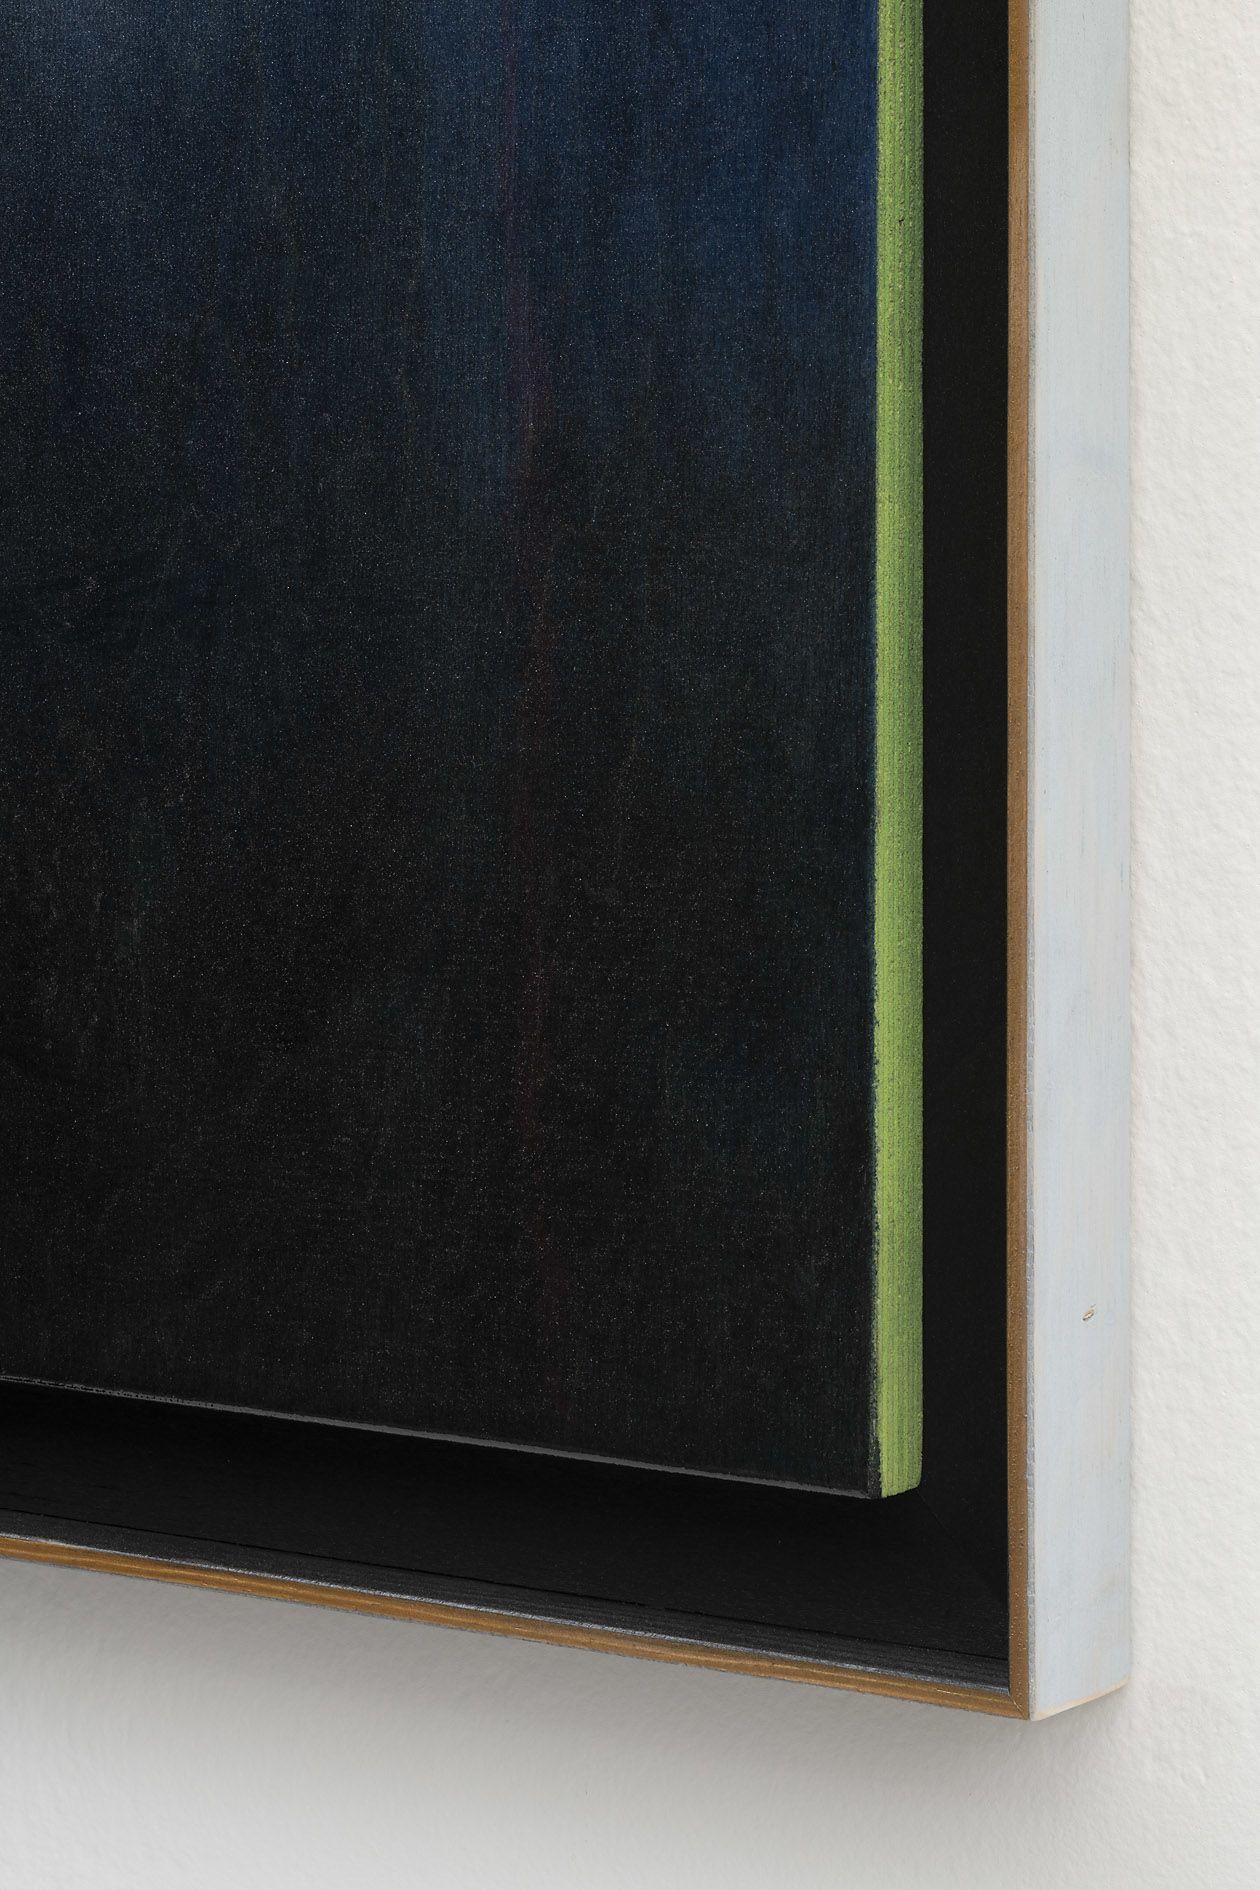 Robert Elfgen – Higgs-Boson – Berlin